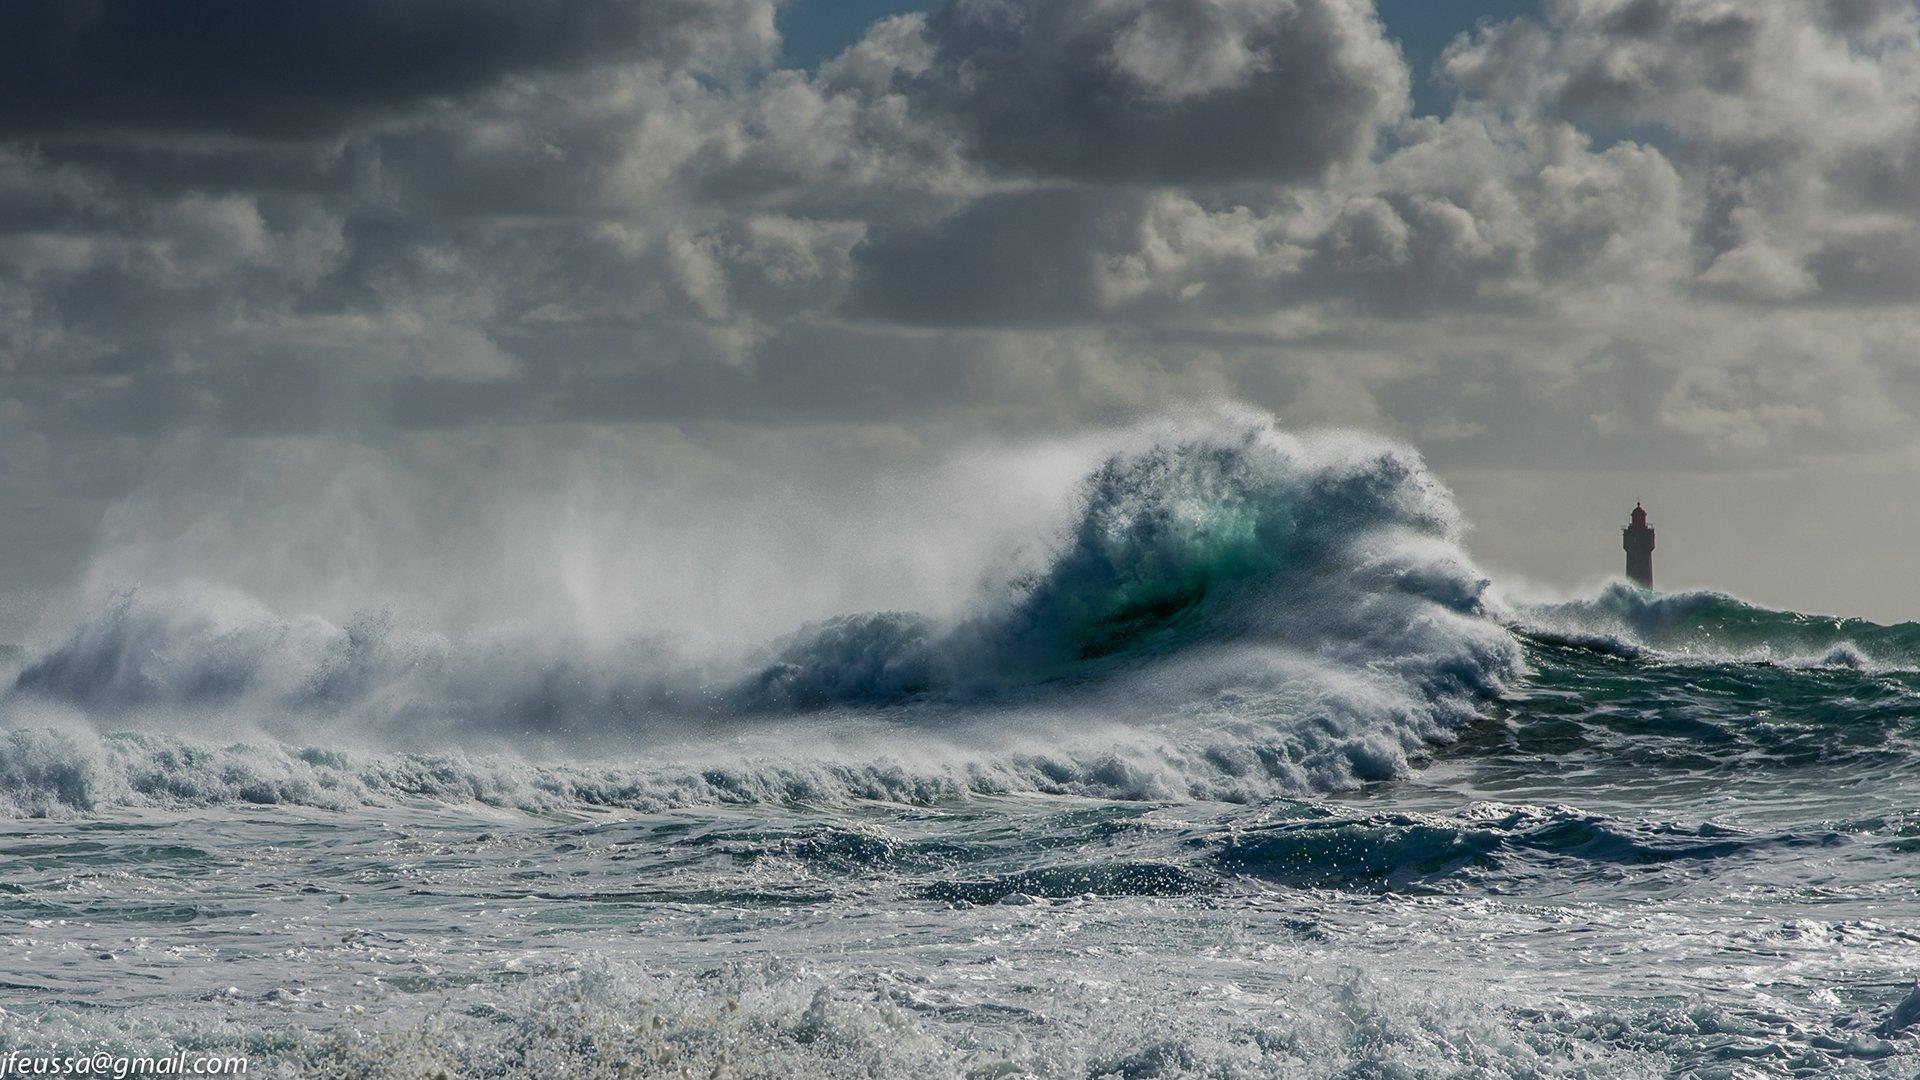 1080p Iphone 7 Plus Wallpaper Ocean Waves In Storm Fond D 233 Cran Hd Arri 232 Re Plan